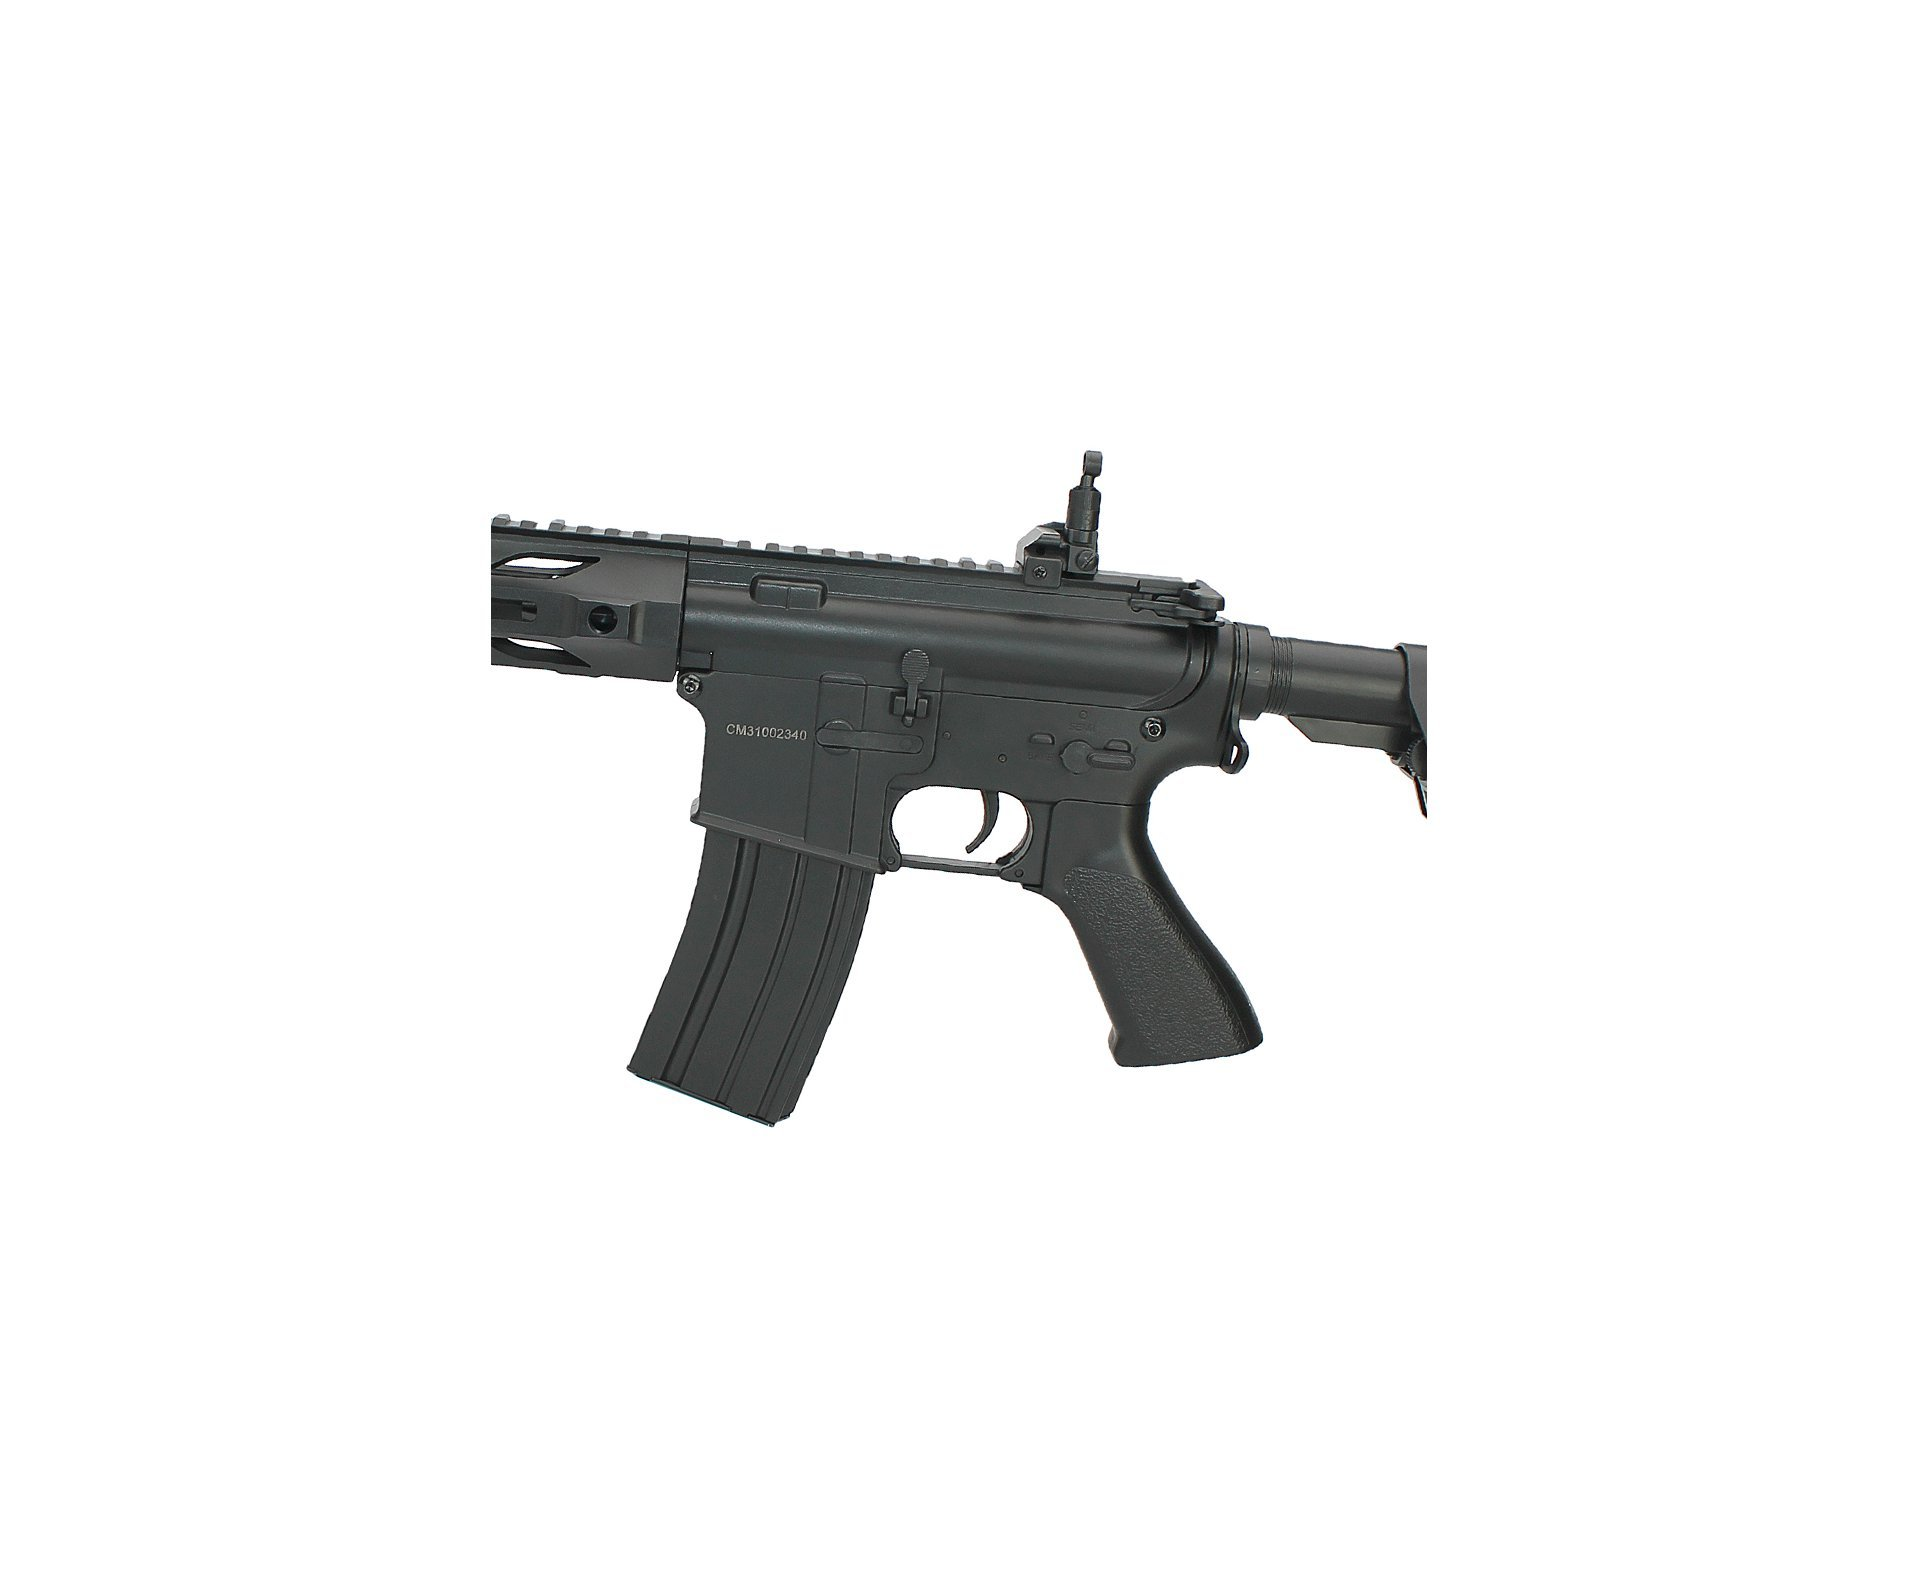 Rifle De Airsoft M4a1 Keymod Cm518 Black - Cal 6mm- Bivolt- Cm518 - Cyma